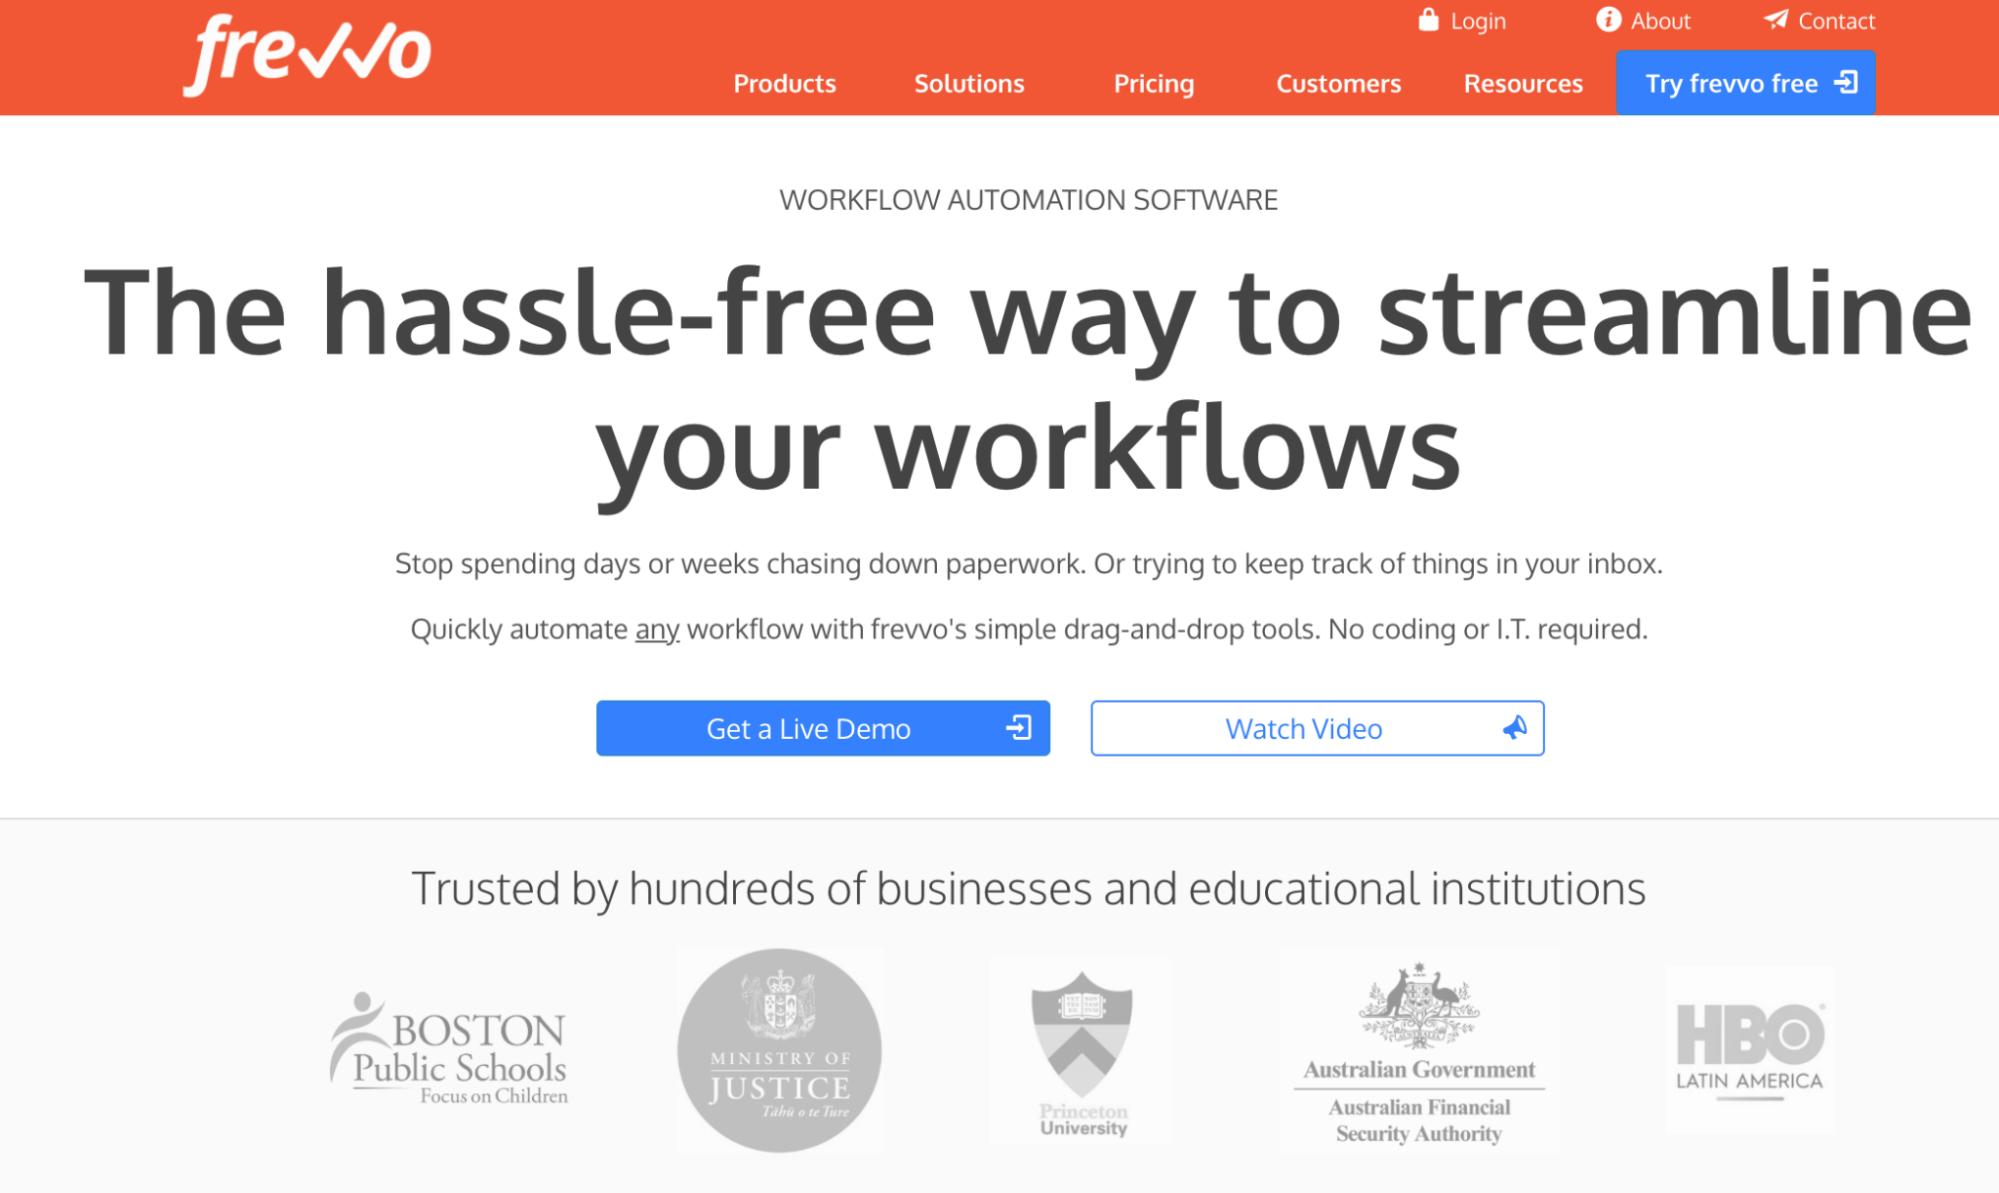 frevvo homepage